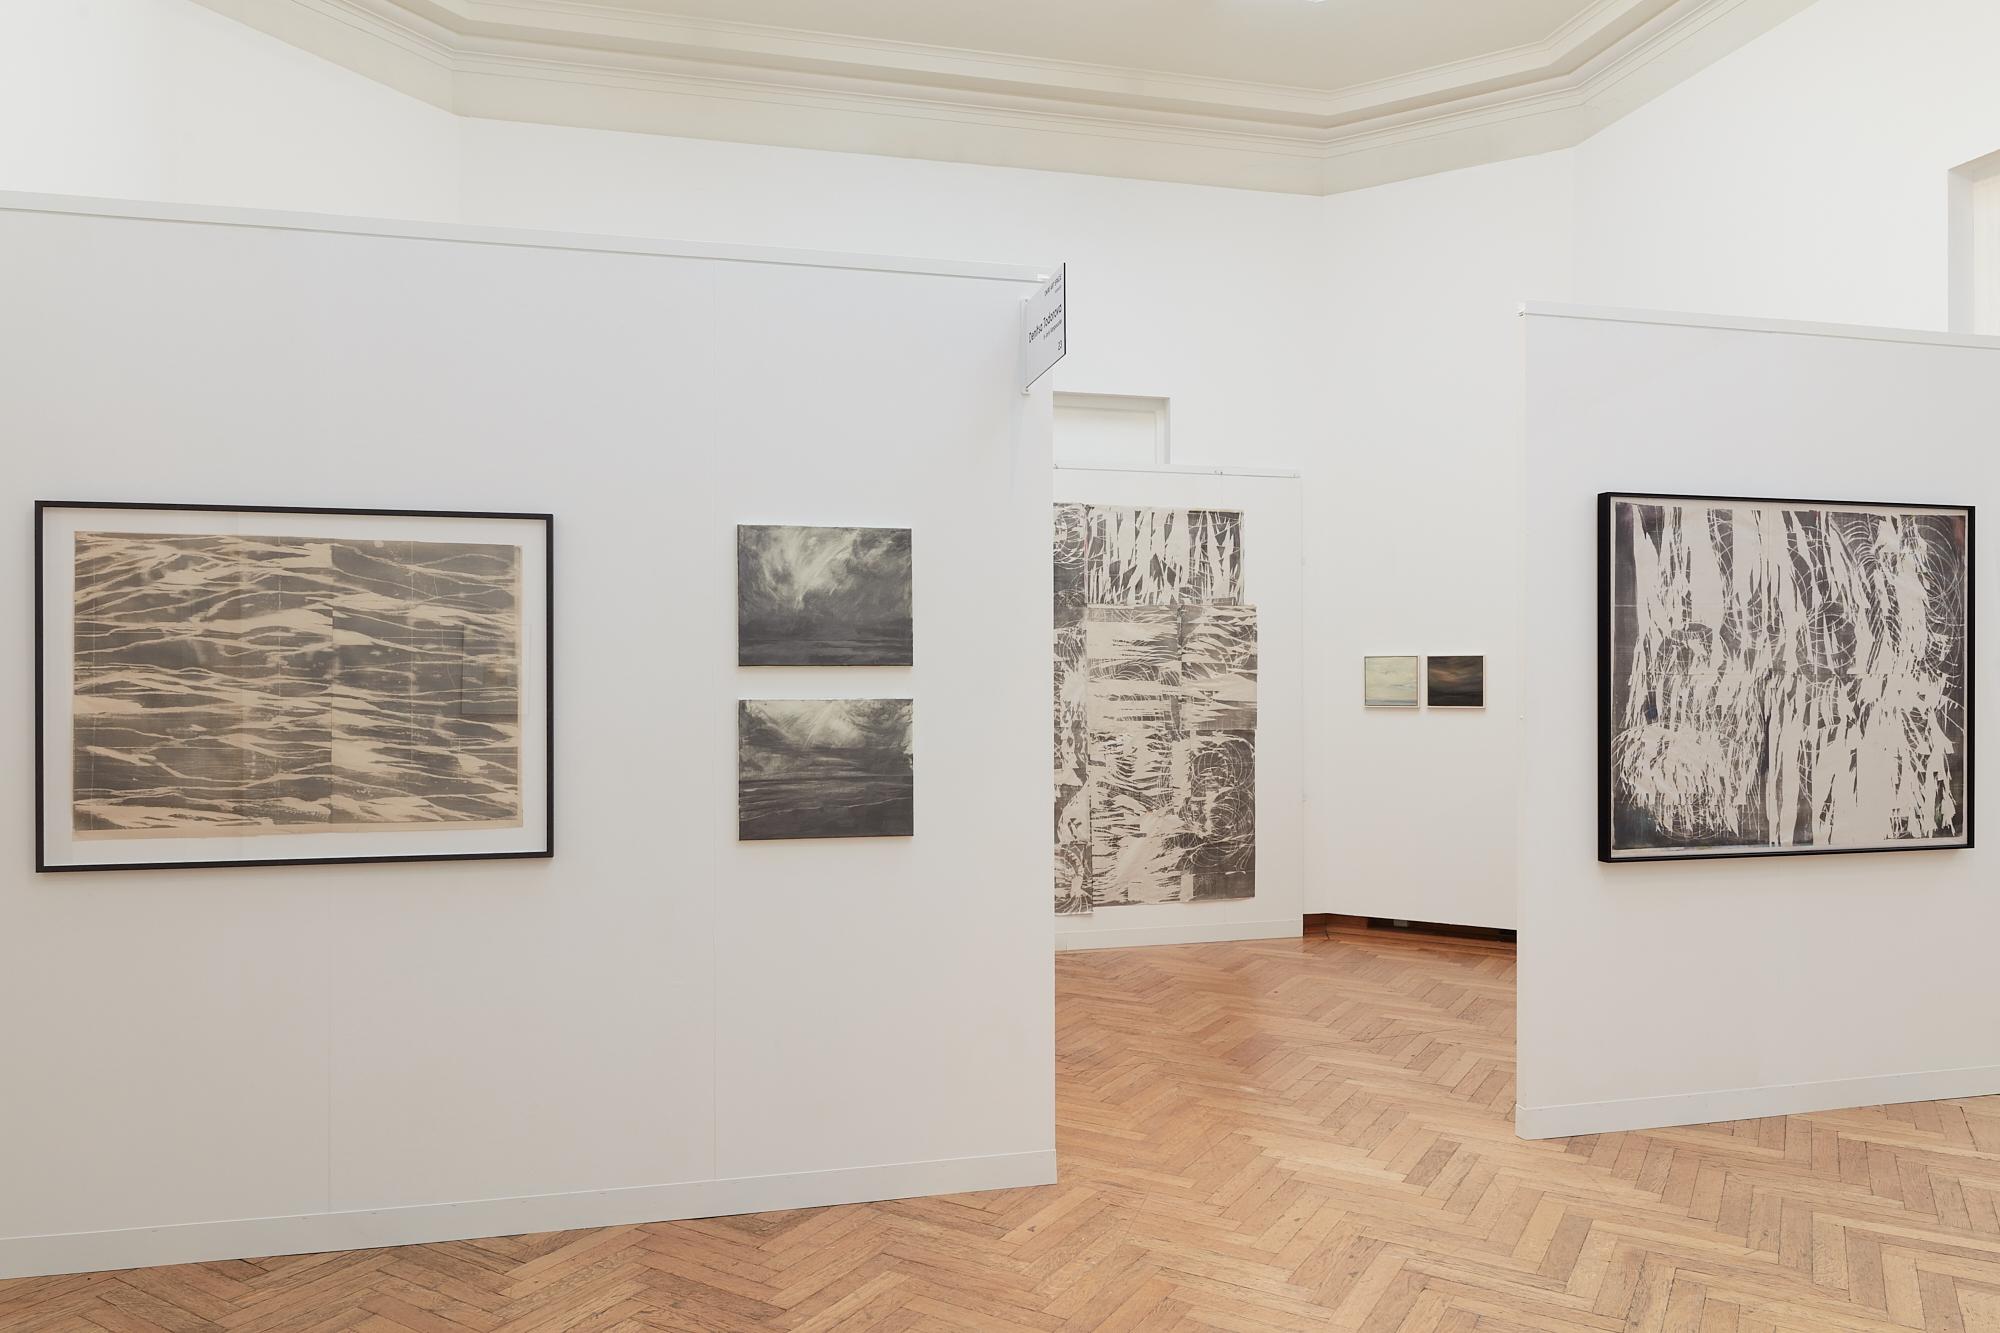 dmw art space, art on paper, denitsa todorova, joris vanpoucke